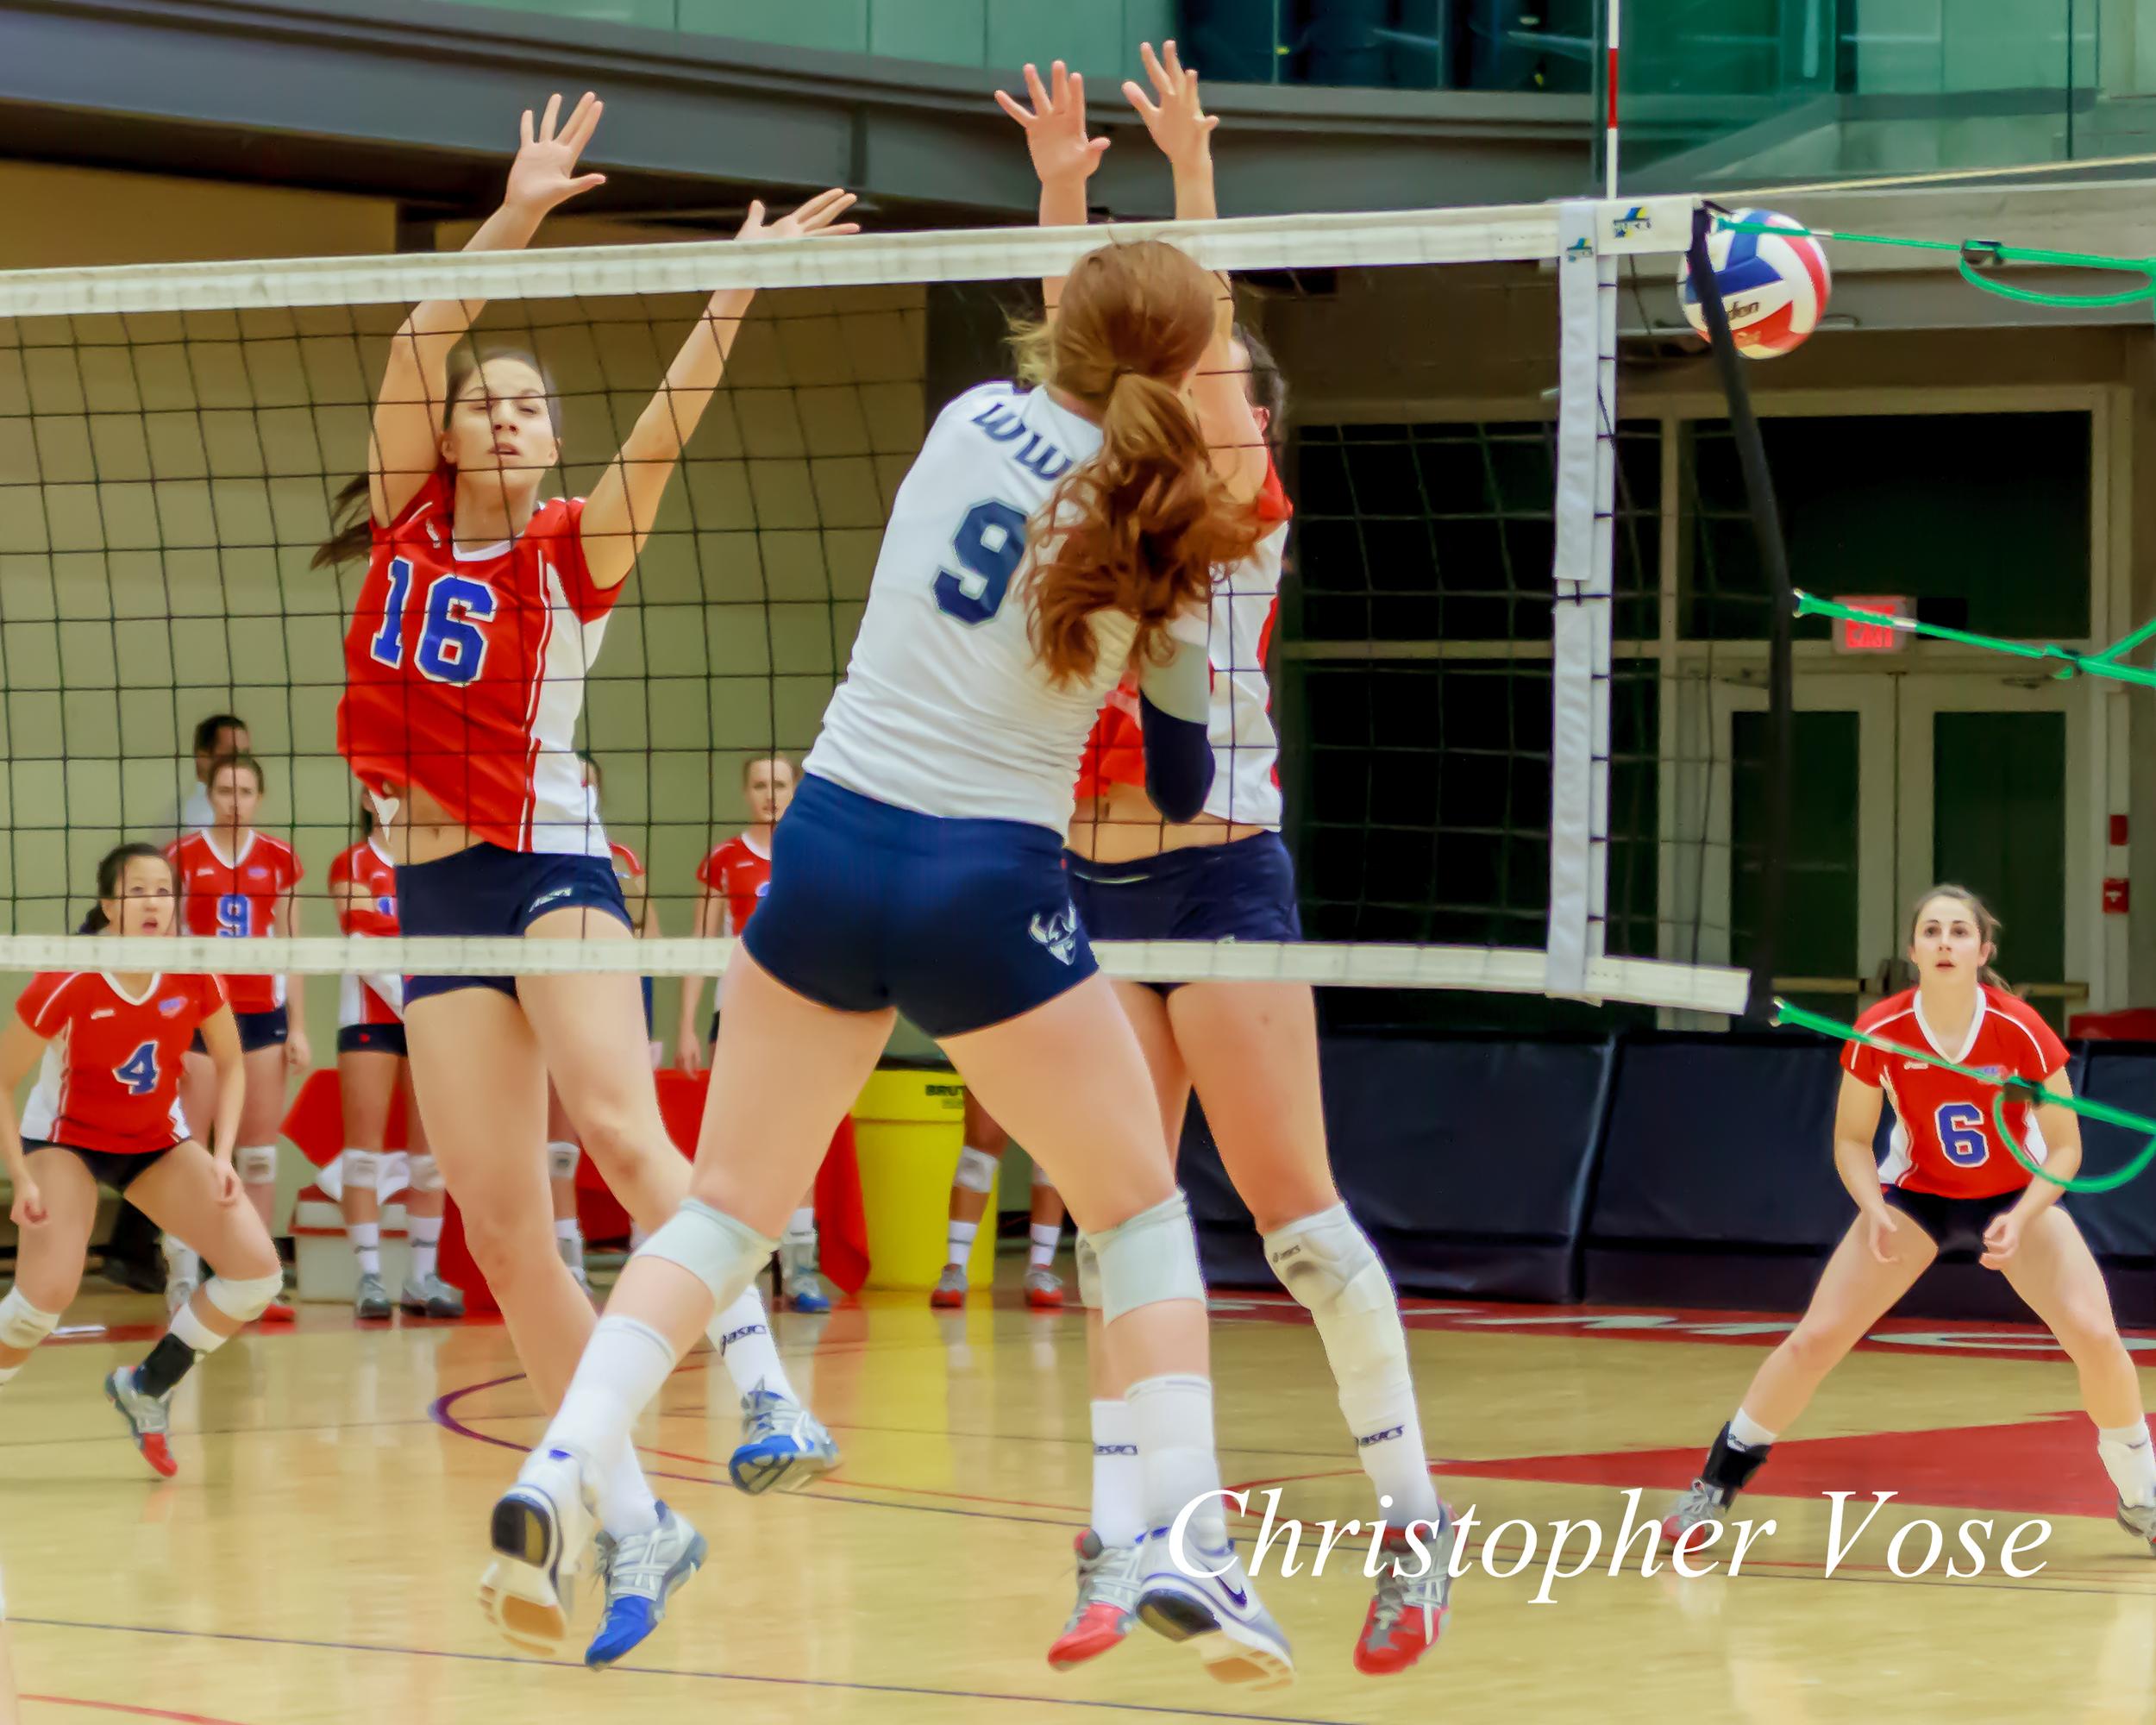 2012-10-13 Amanda Renkema and Jennica McPherson.jpg